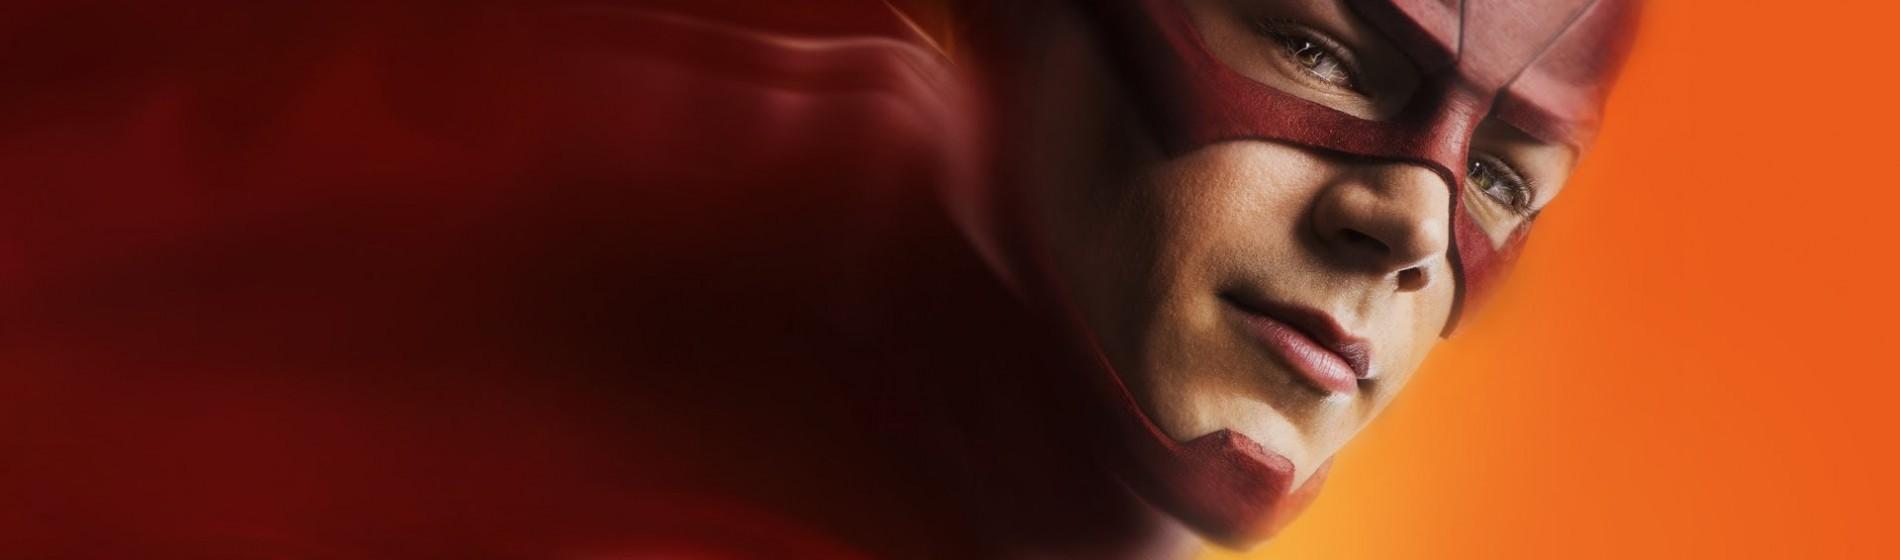 The Flash Season 3 Episode 1 Flashpoint